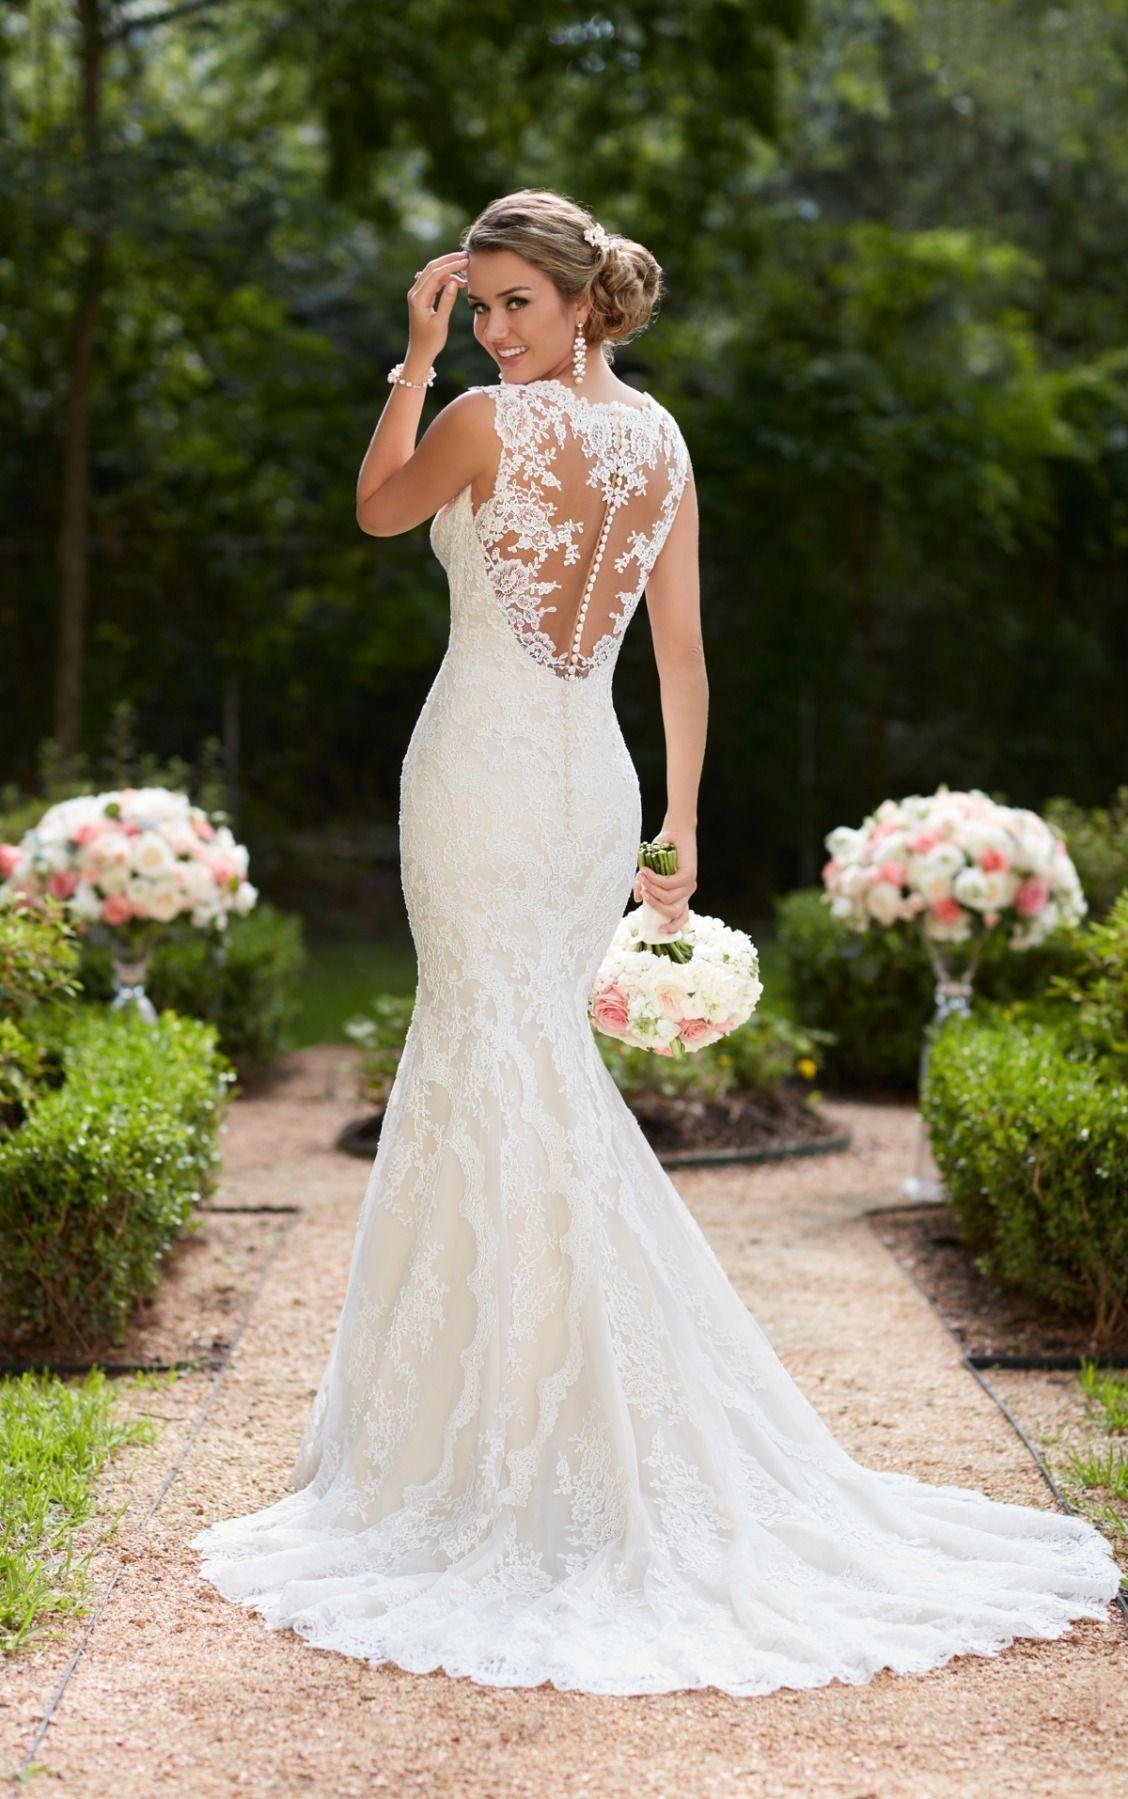 This vintage lace trumpet wedding dress by Stella York